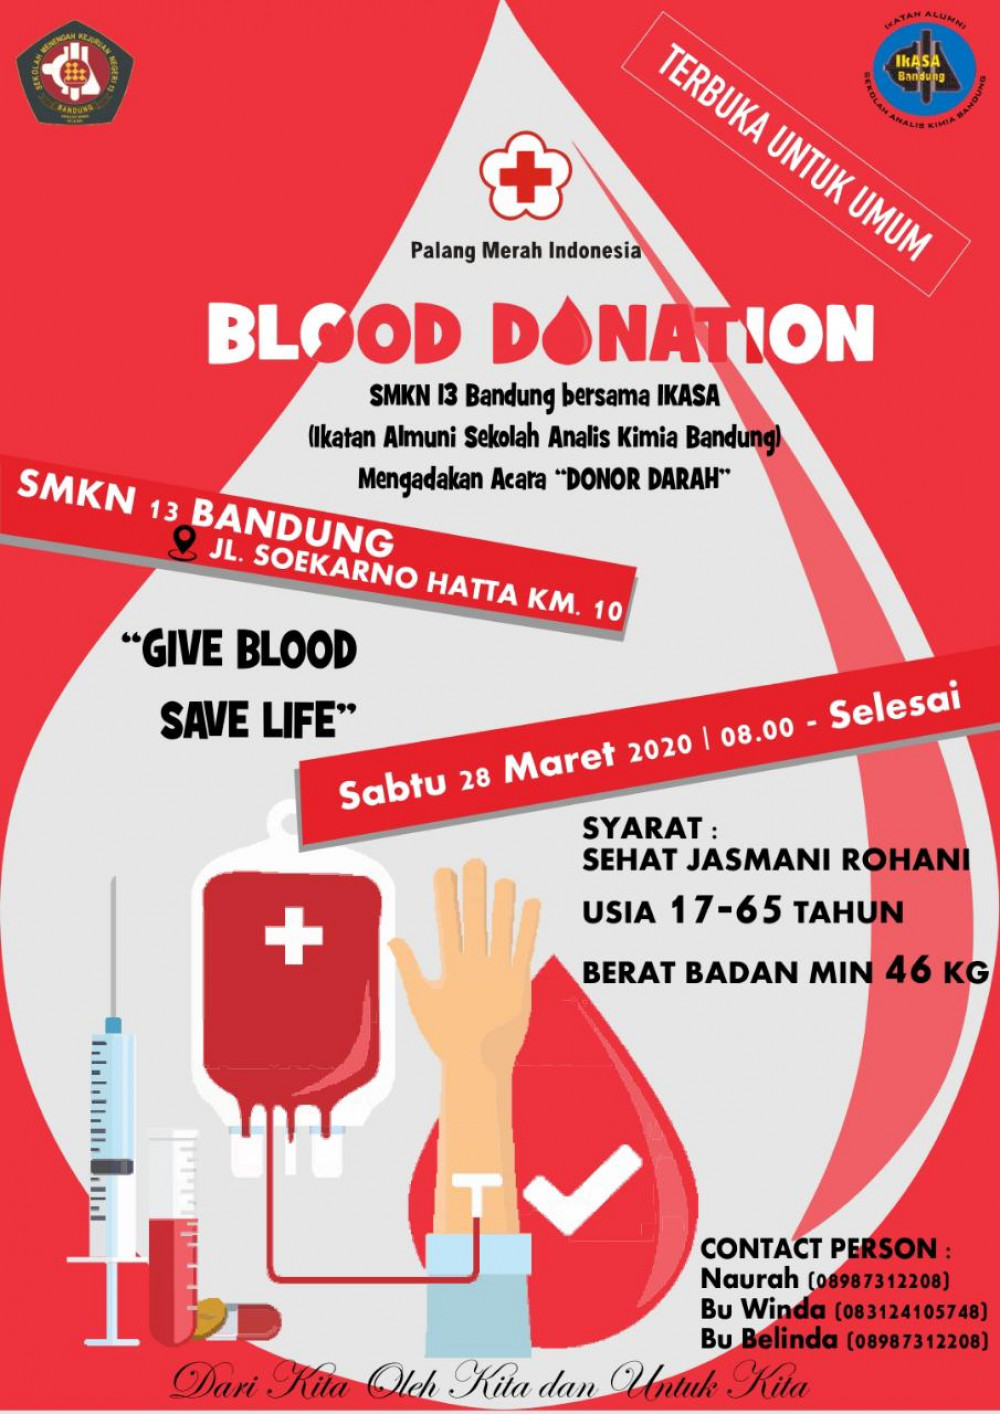 Blood Donation SMKN 13 Bandung